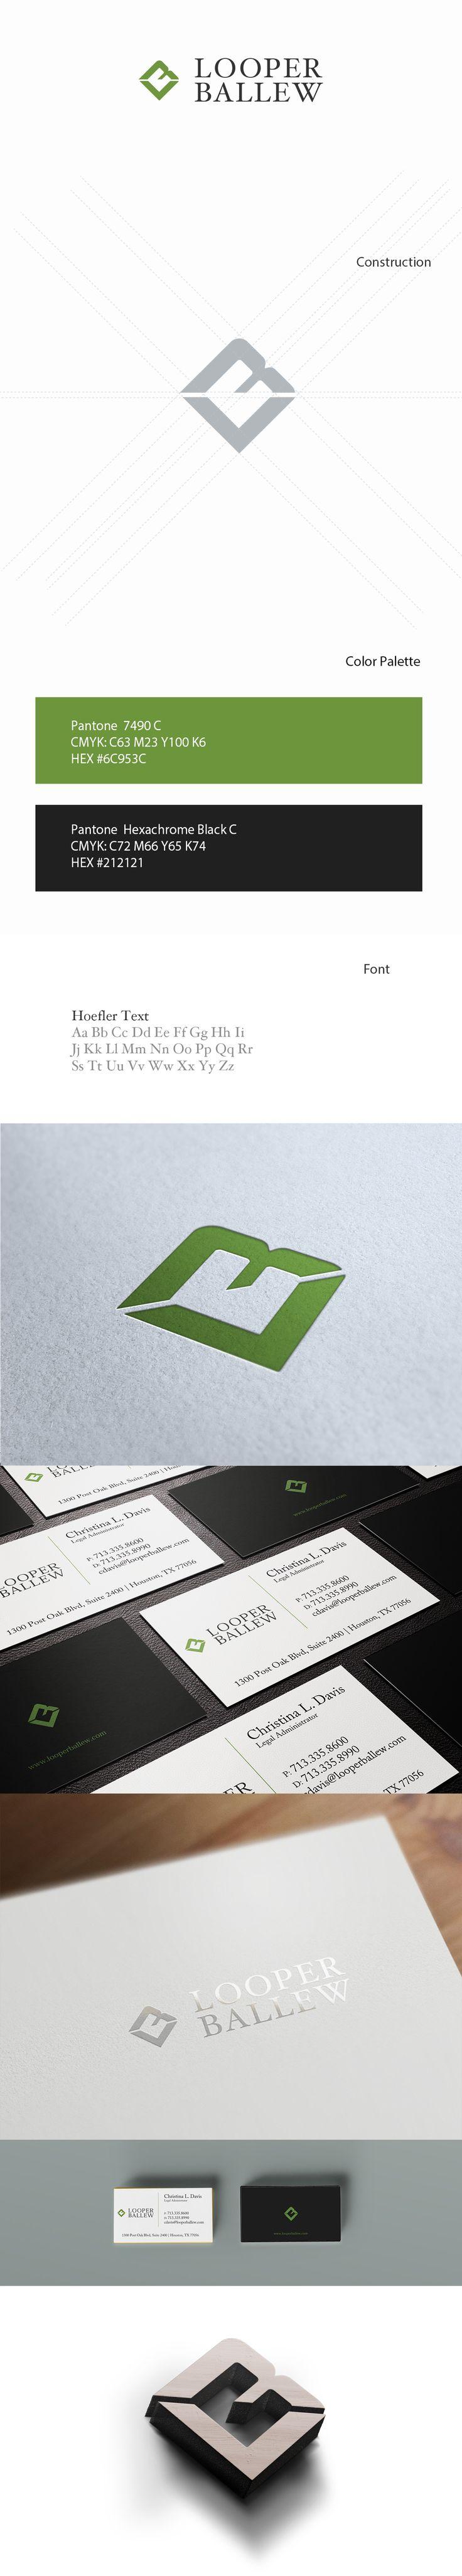 Looper Ballew - Law Firm Branding & Logo Design